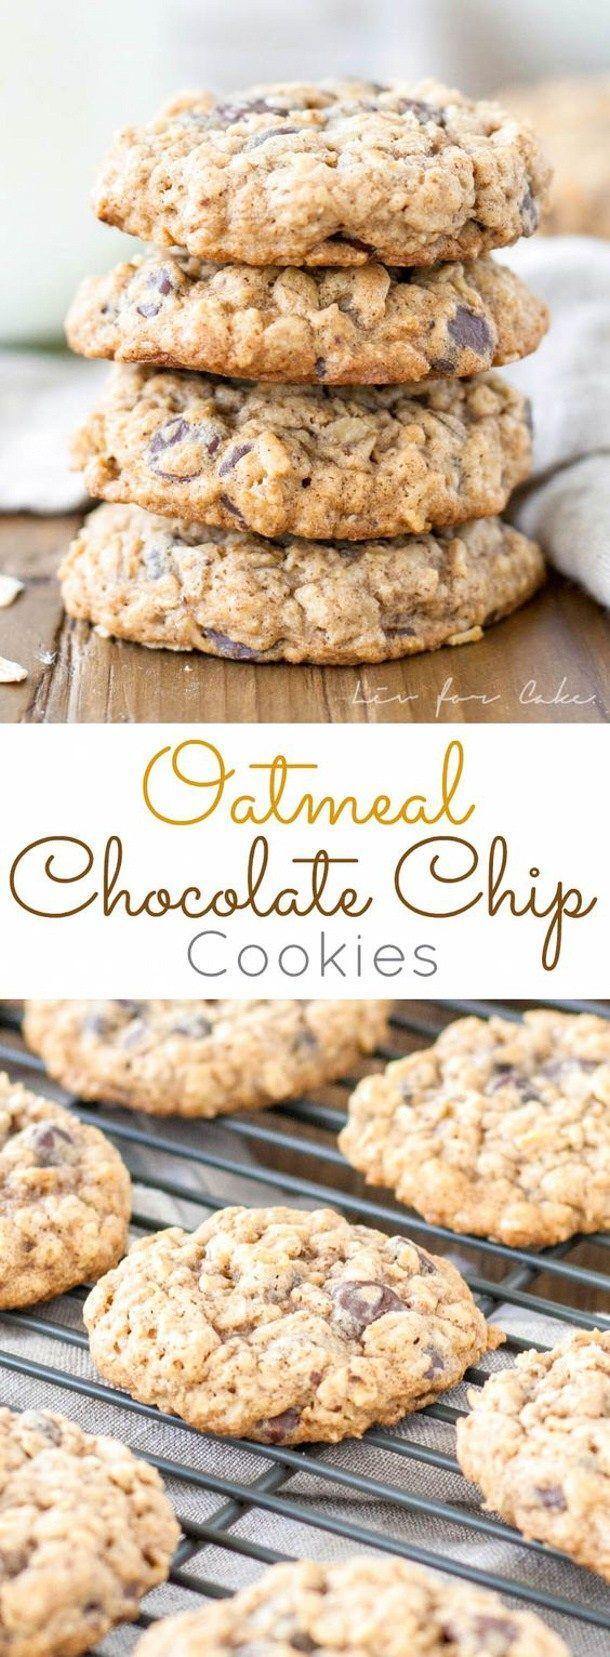 Oatmeal Chocolate Chip Cookies Recipe via Liv for Cake - So Yummy